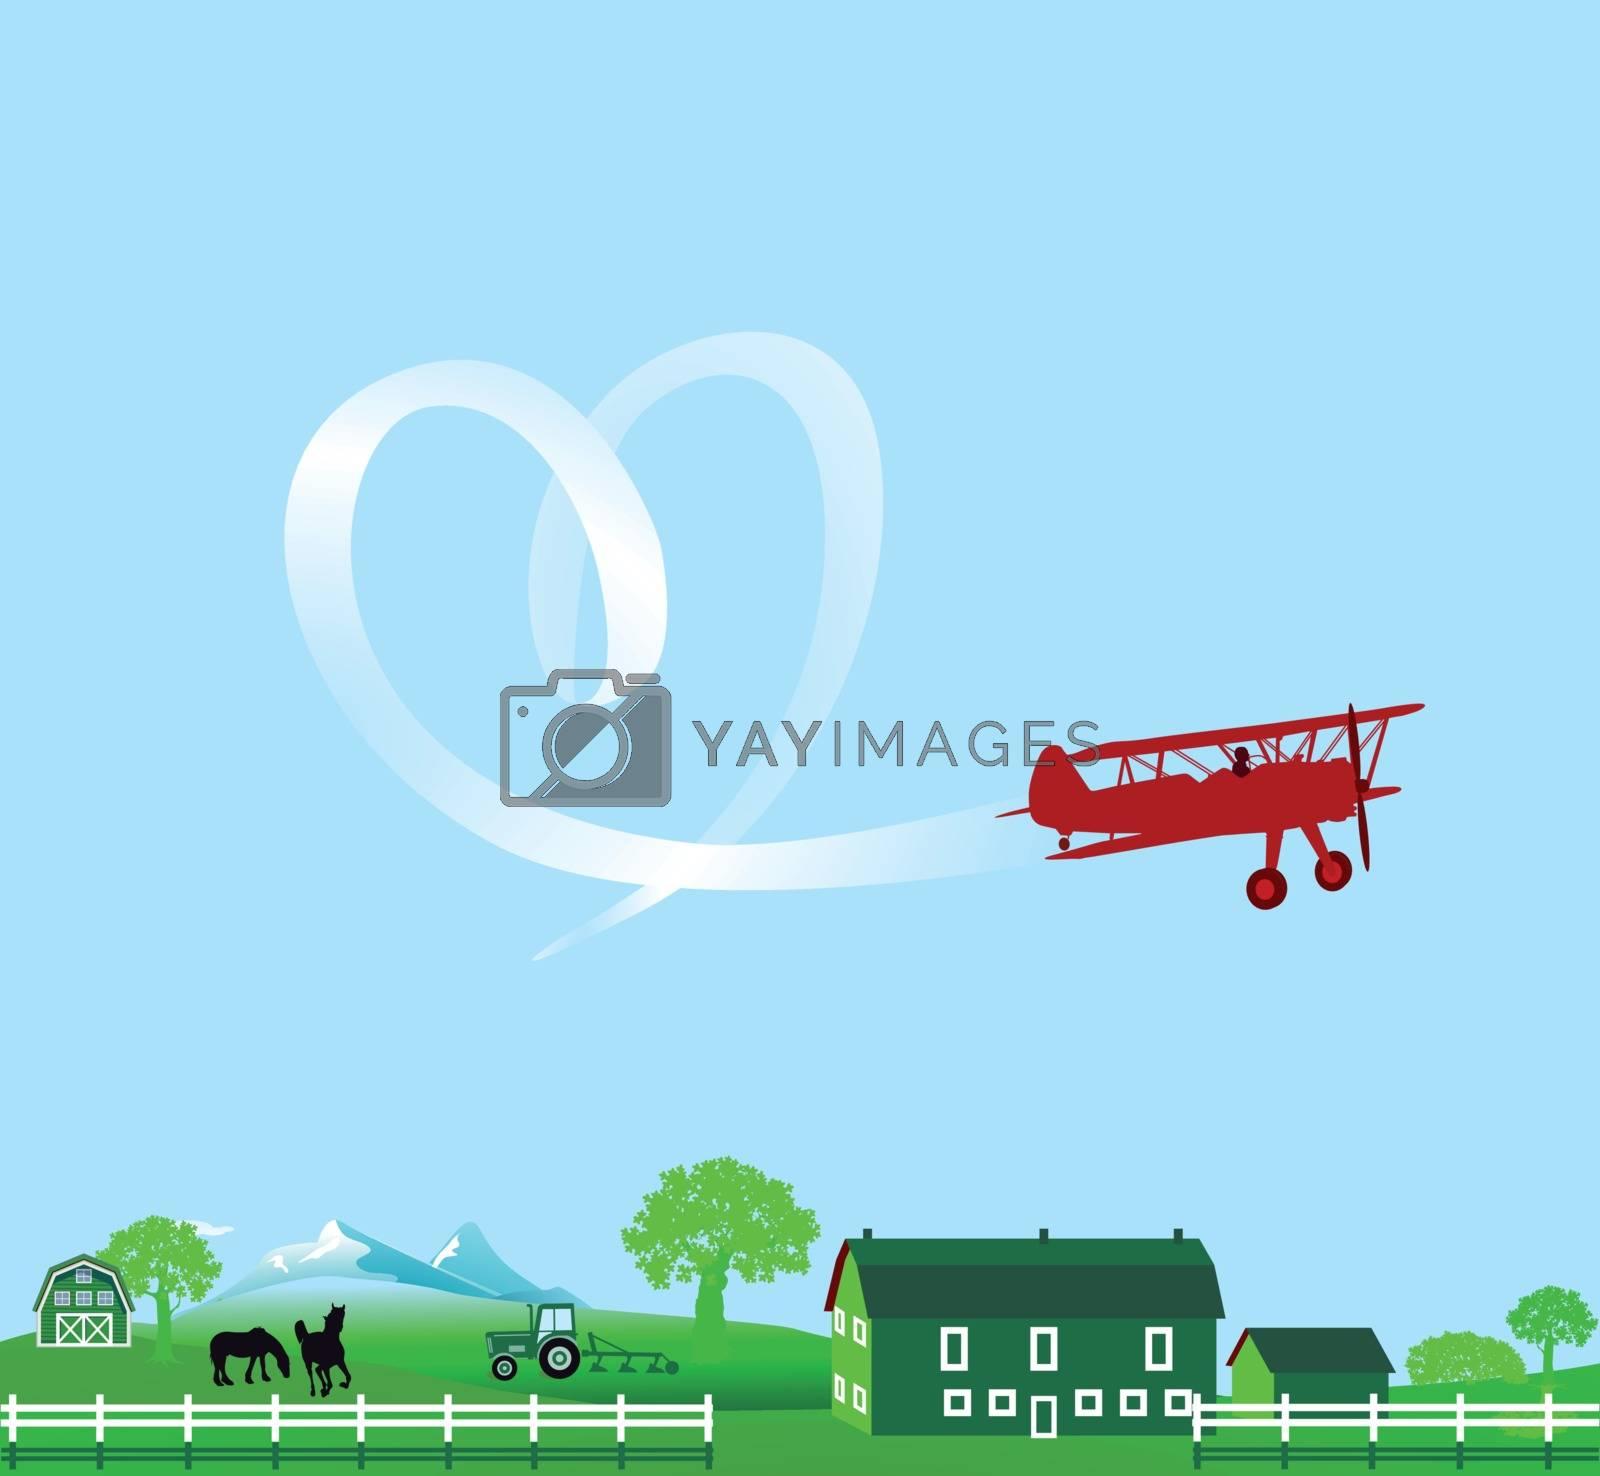 sky writer notice illustration